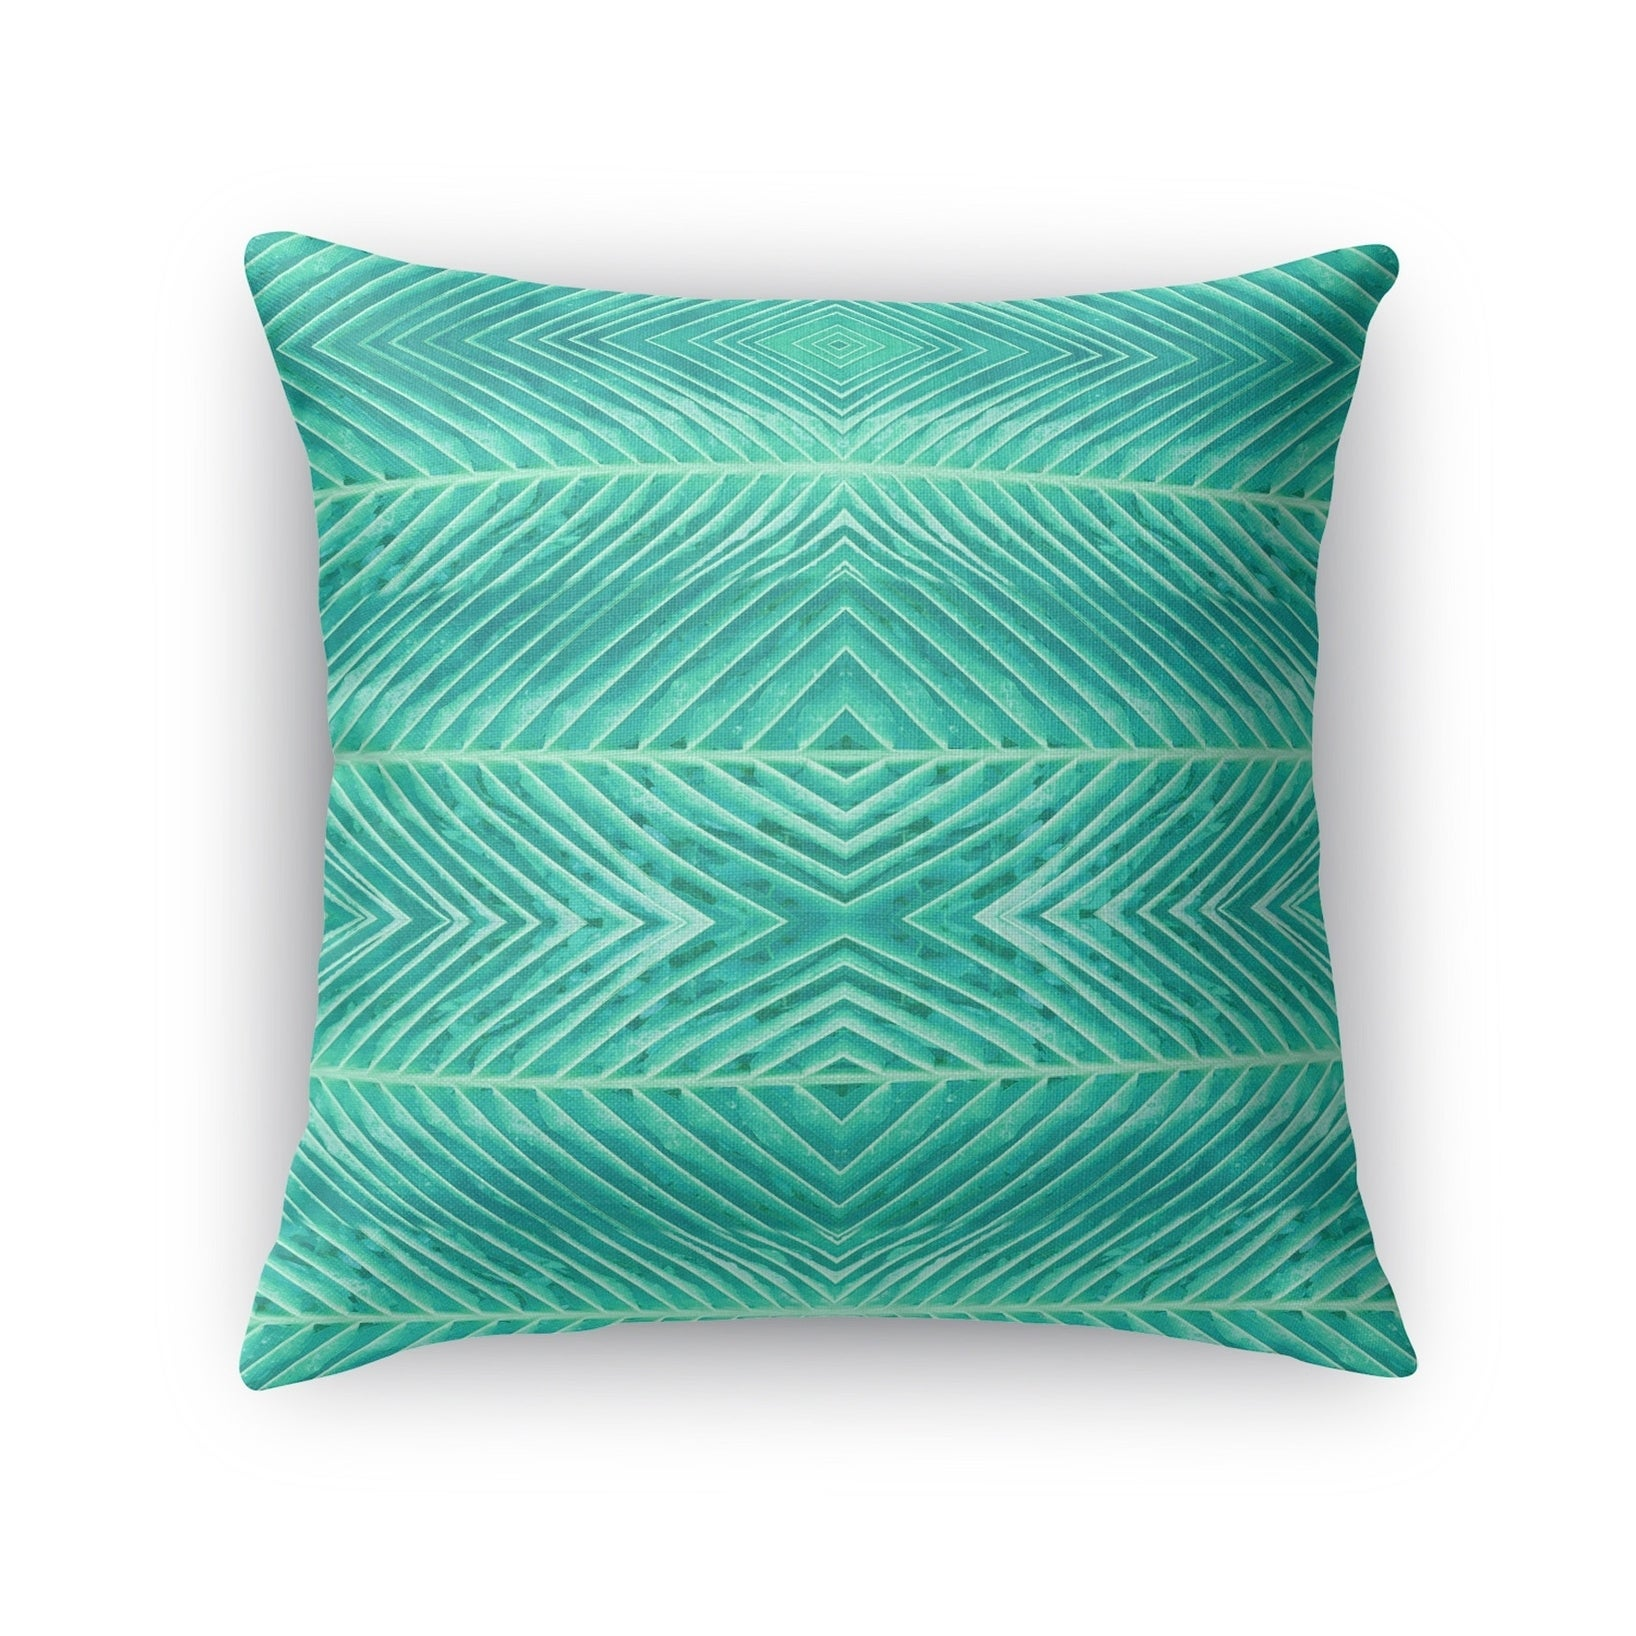 Kavka Designs green blue green palms accent pillow with insert (18 x 18)